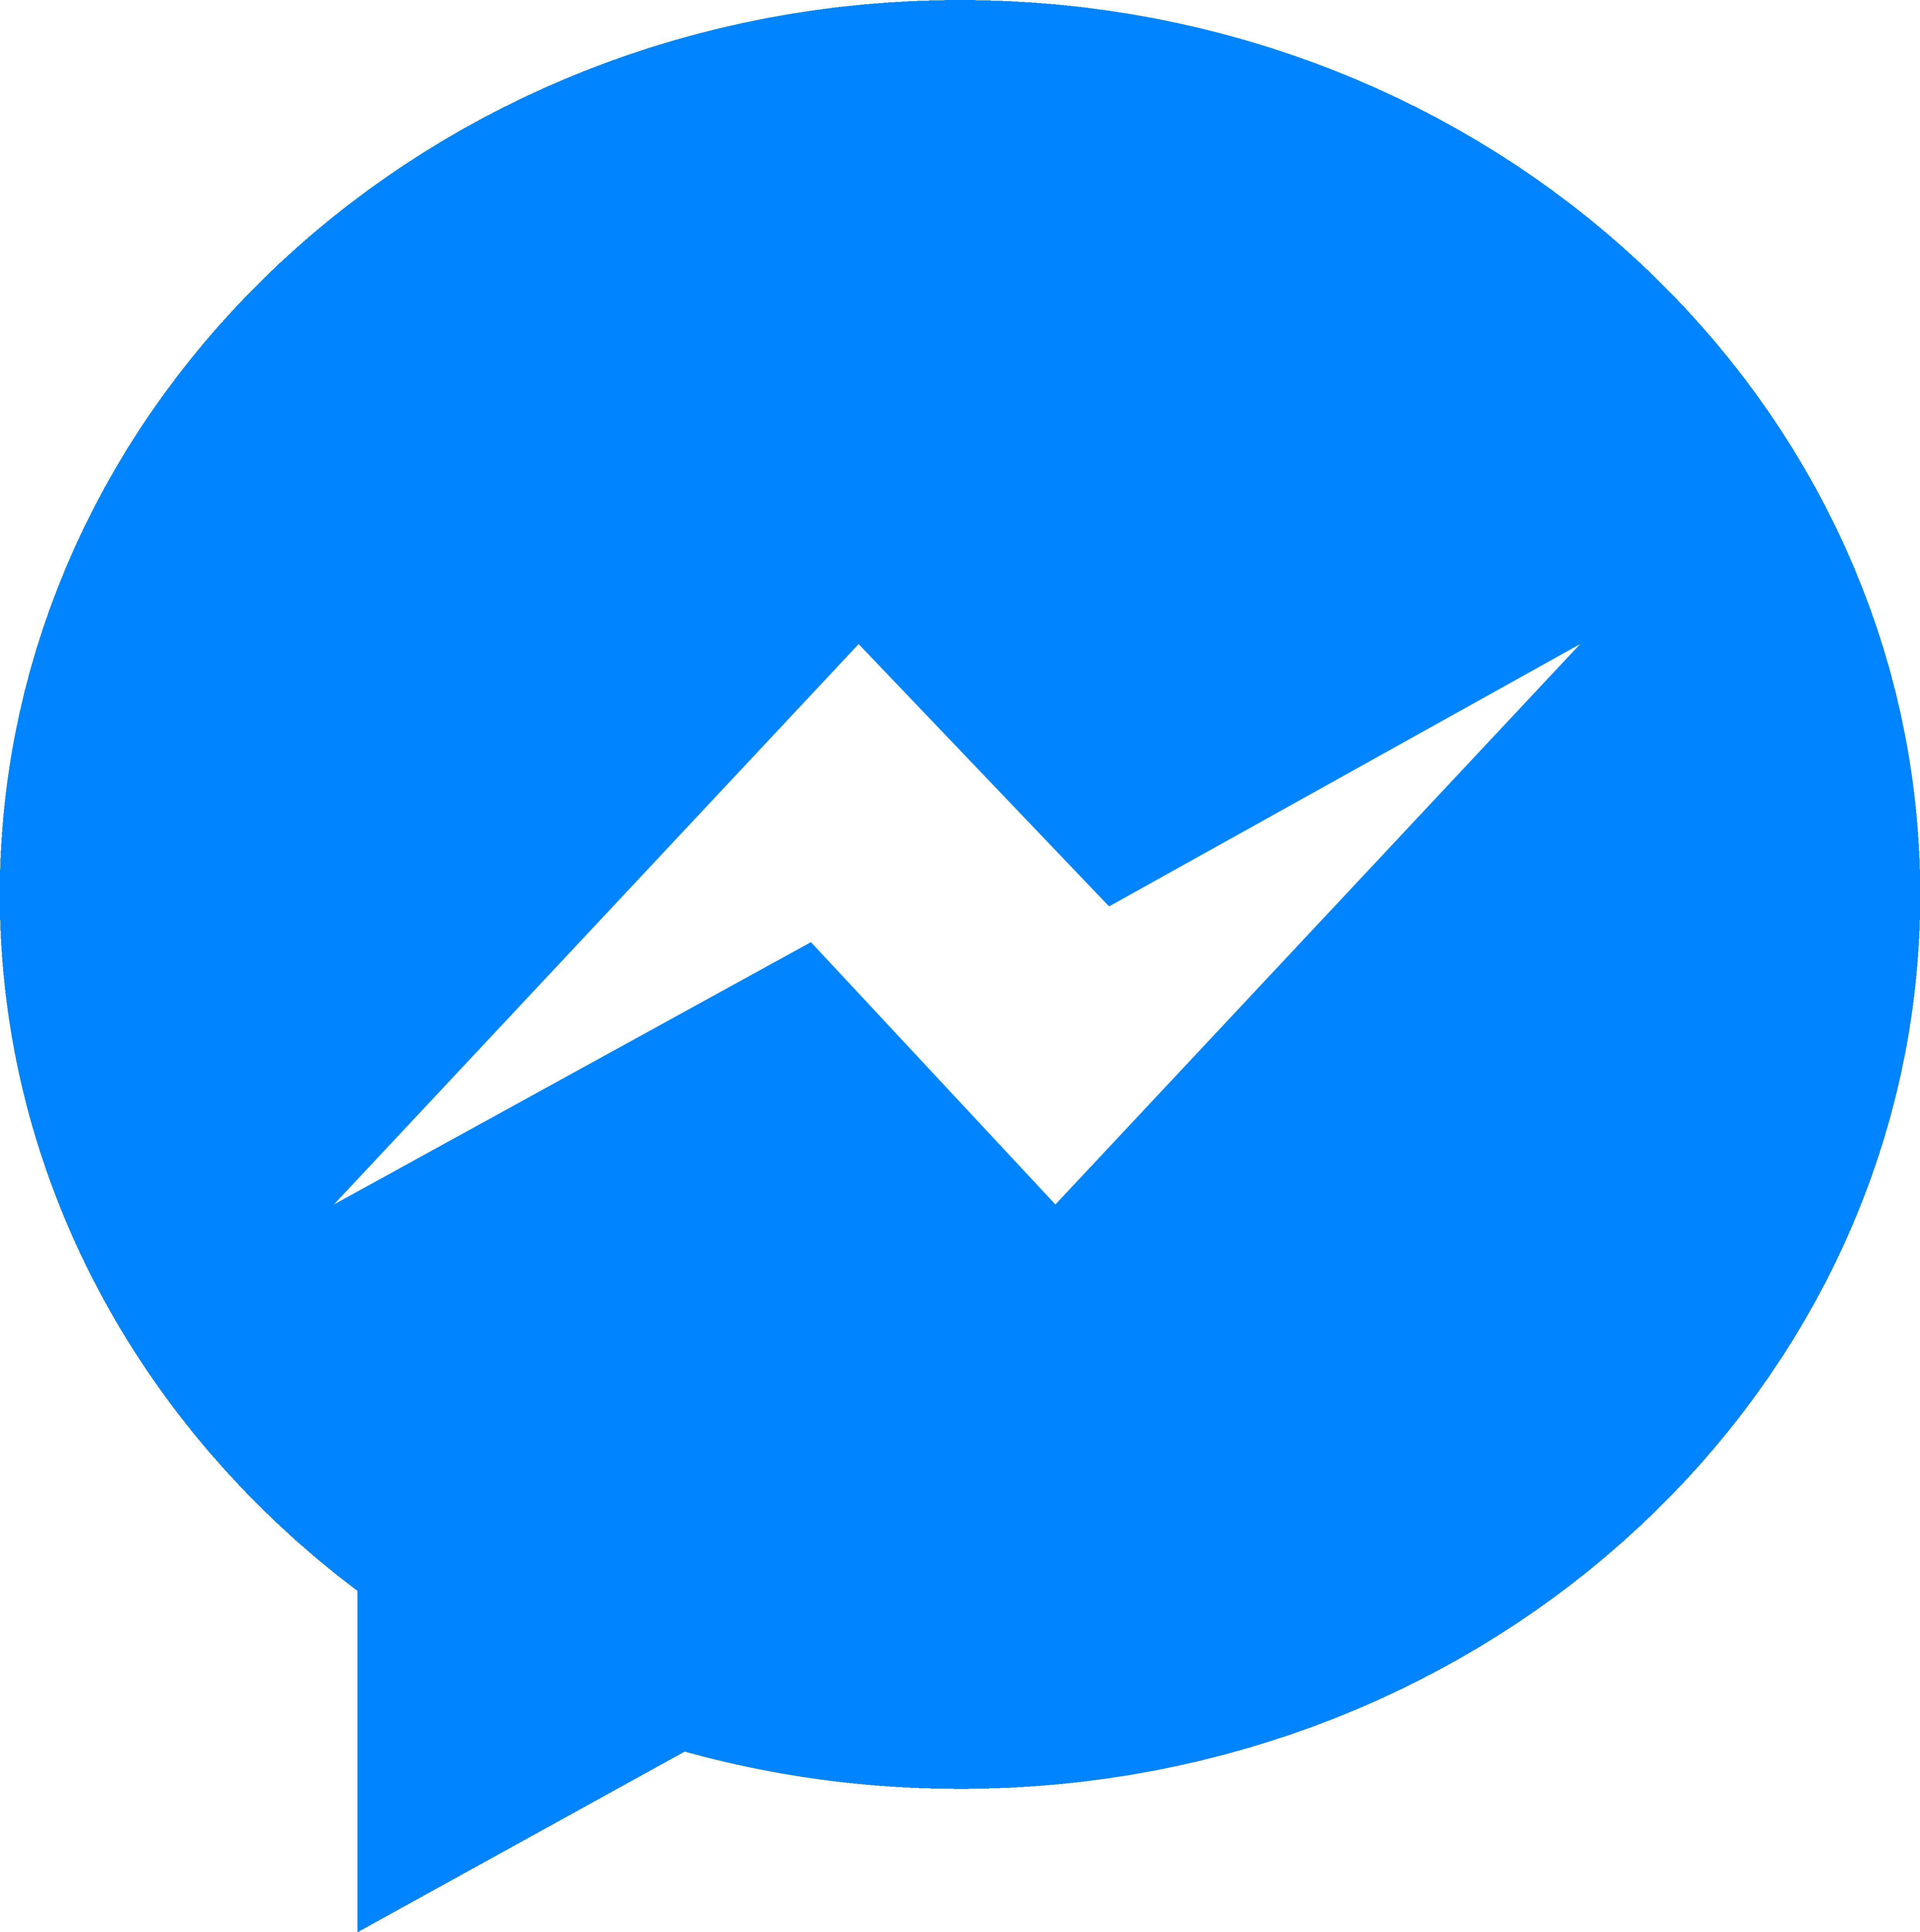 messenger logos transparent clickable sizes them